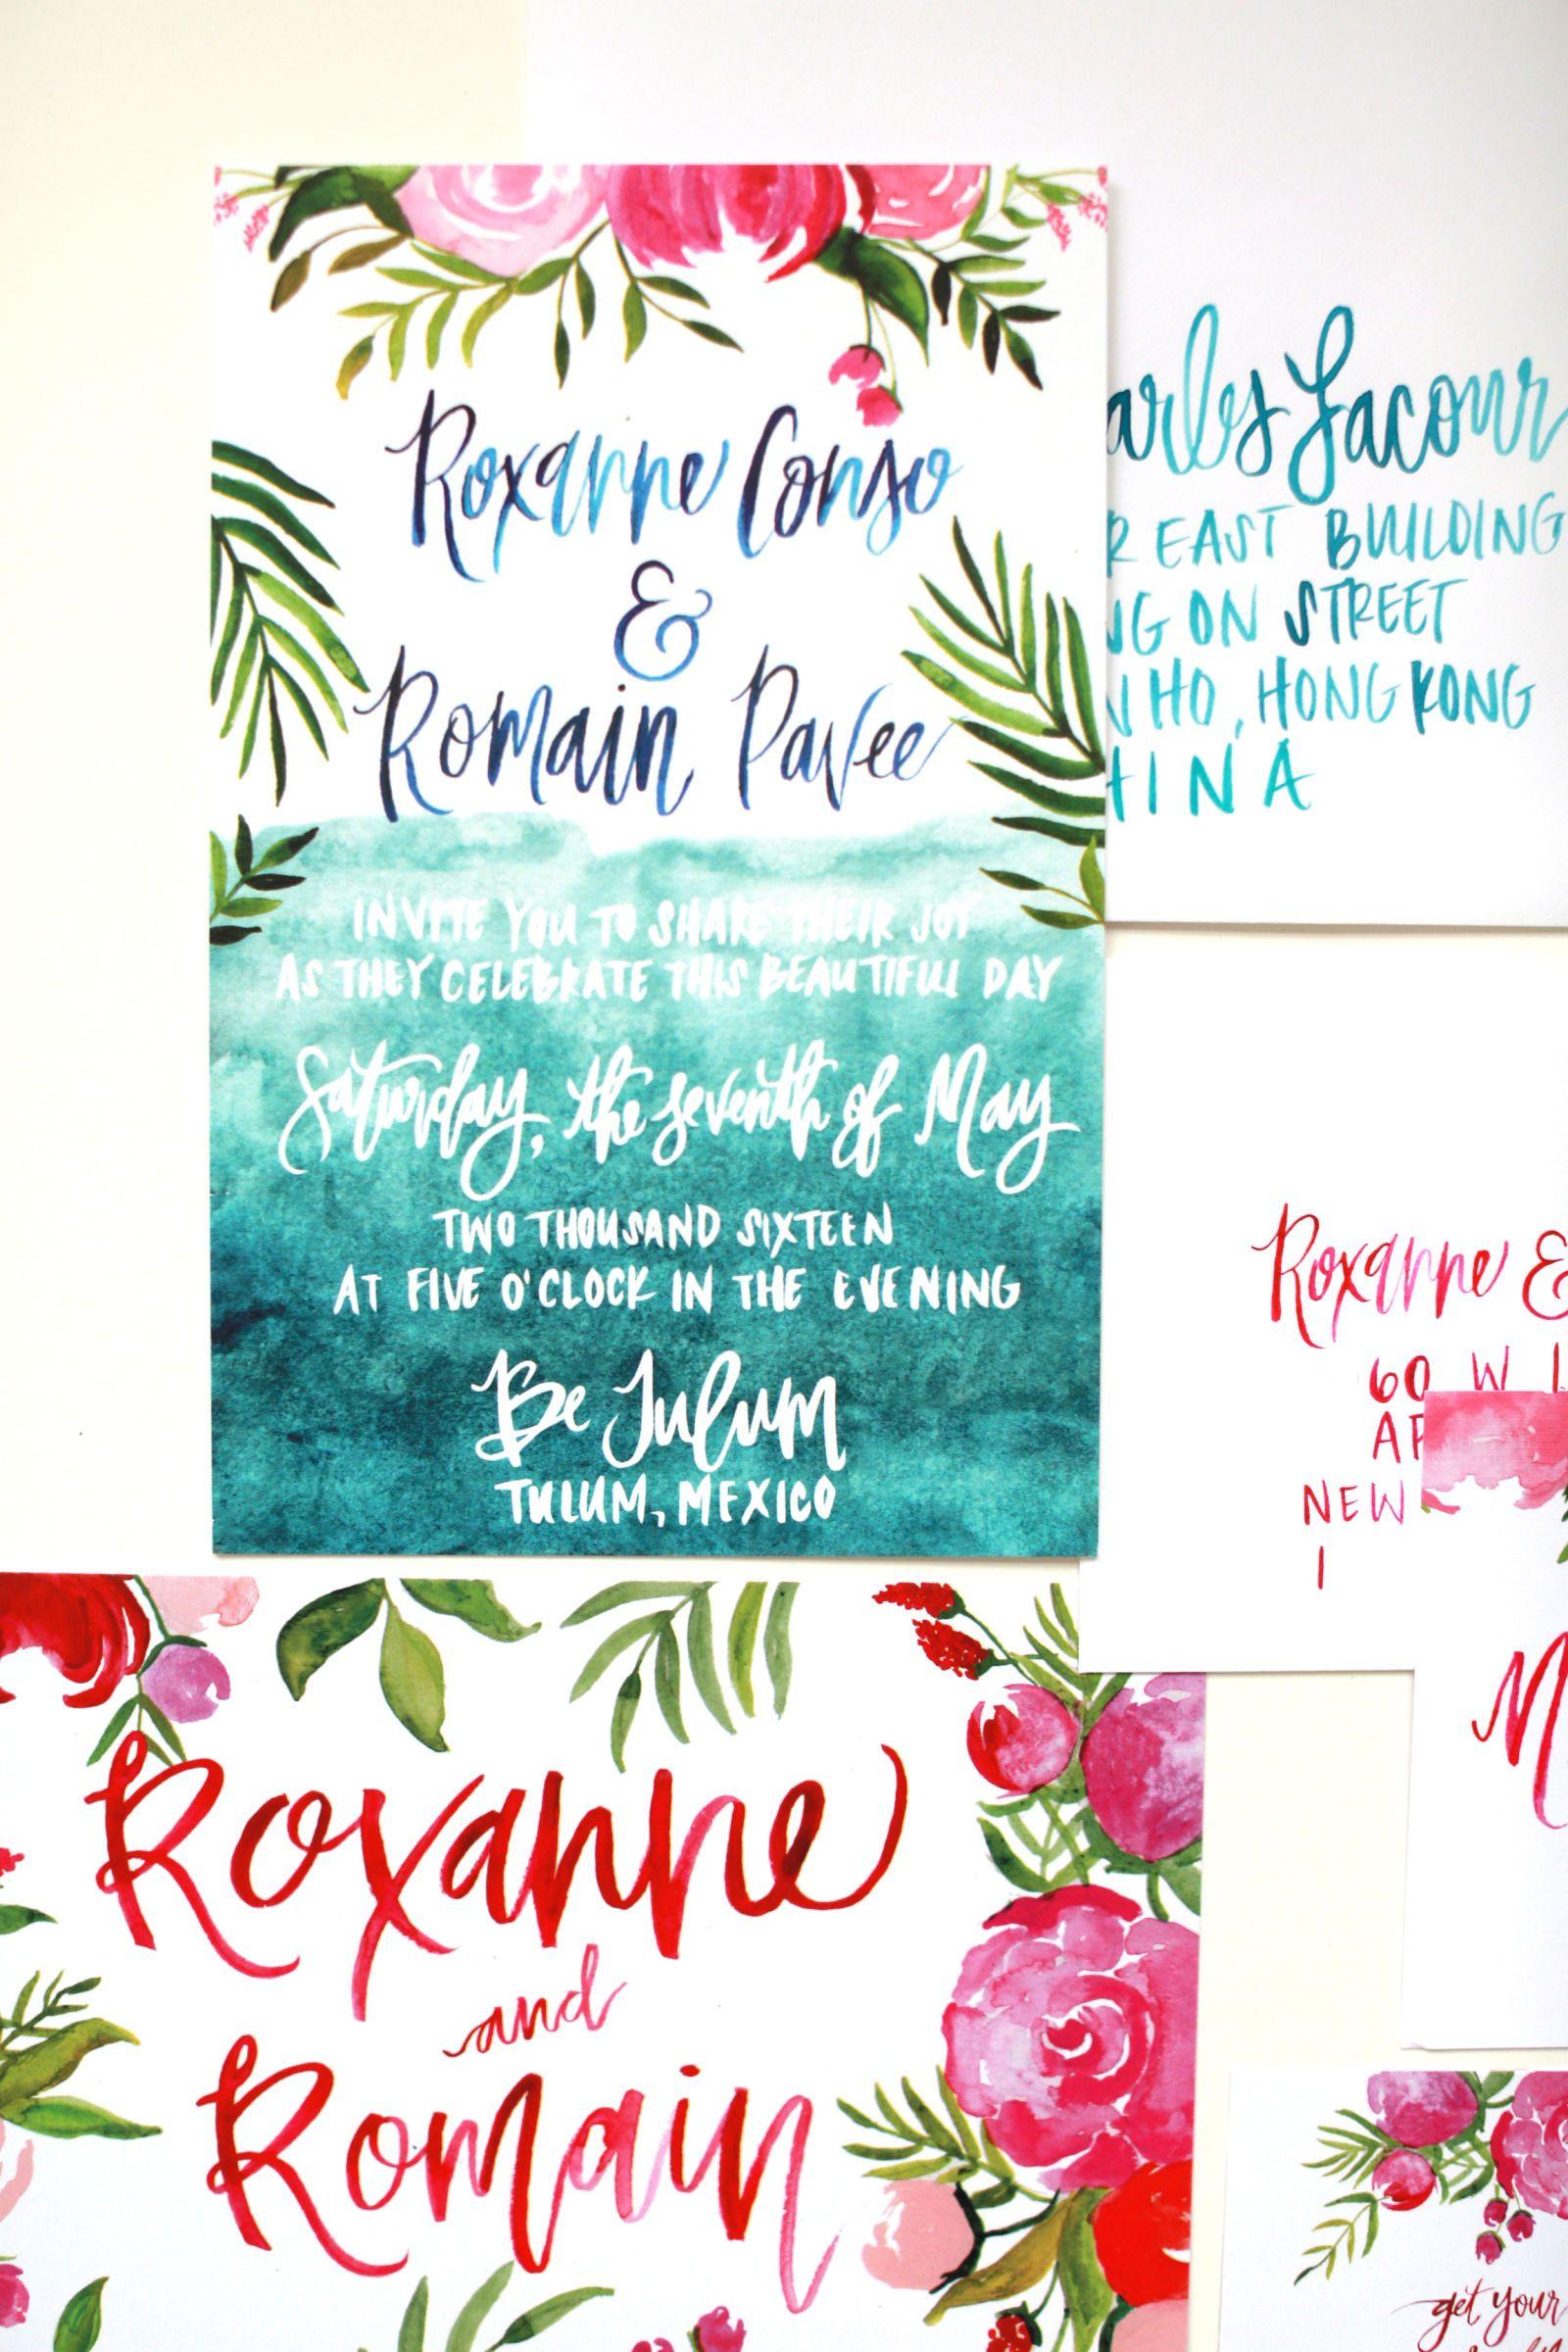 Paradise Found Roxanne Conso Romain Pavee S Wedding In Tulum